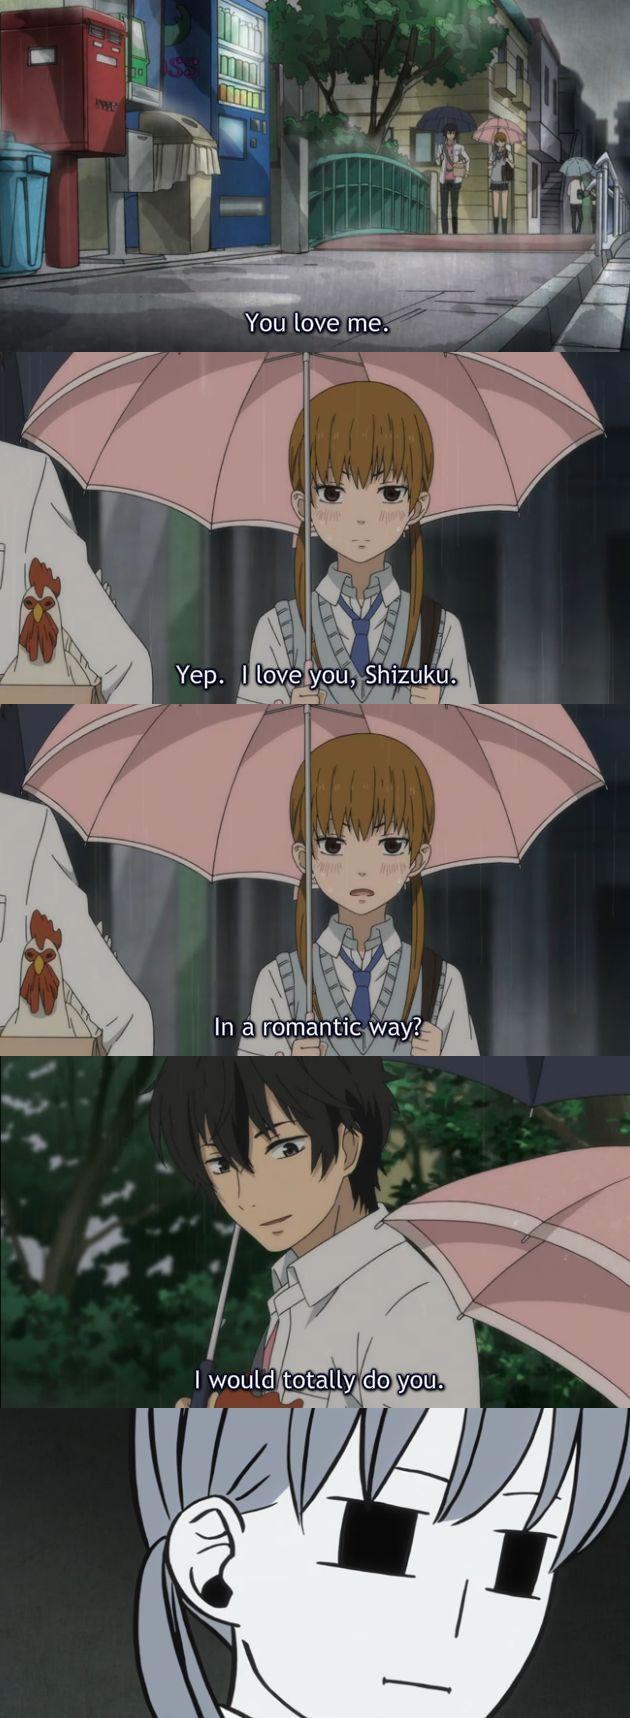 ahhahahahahah my little monster anime